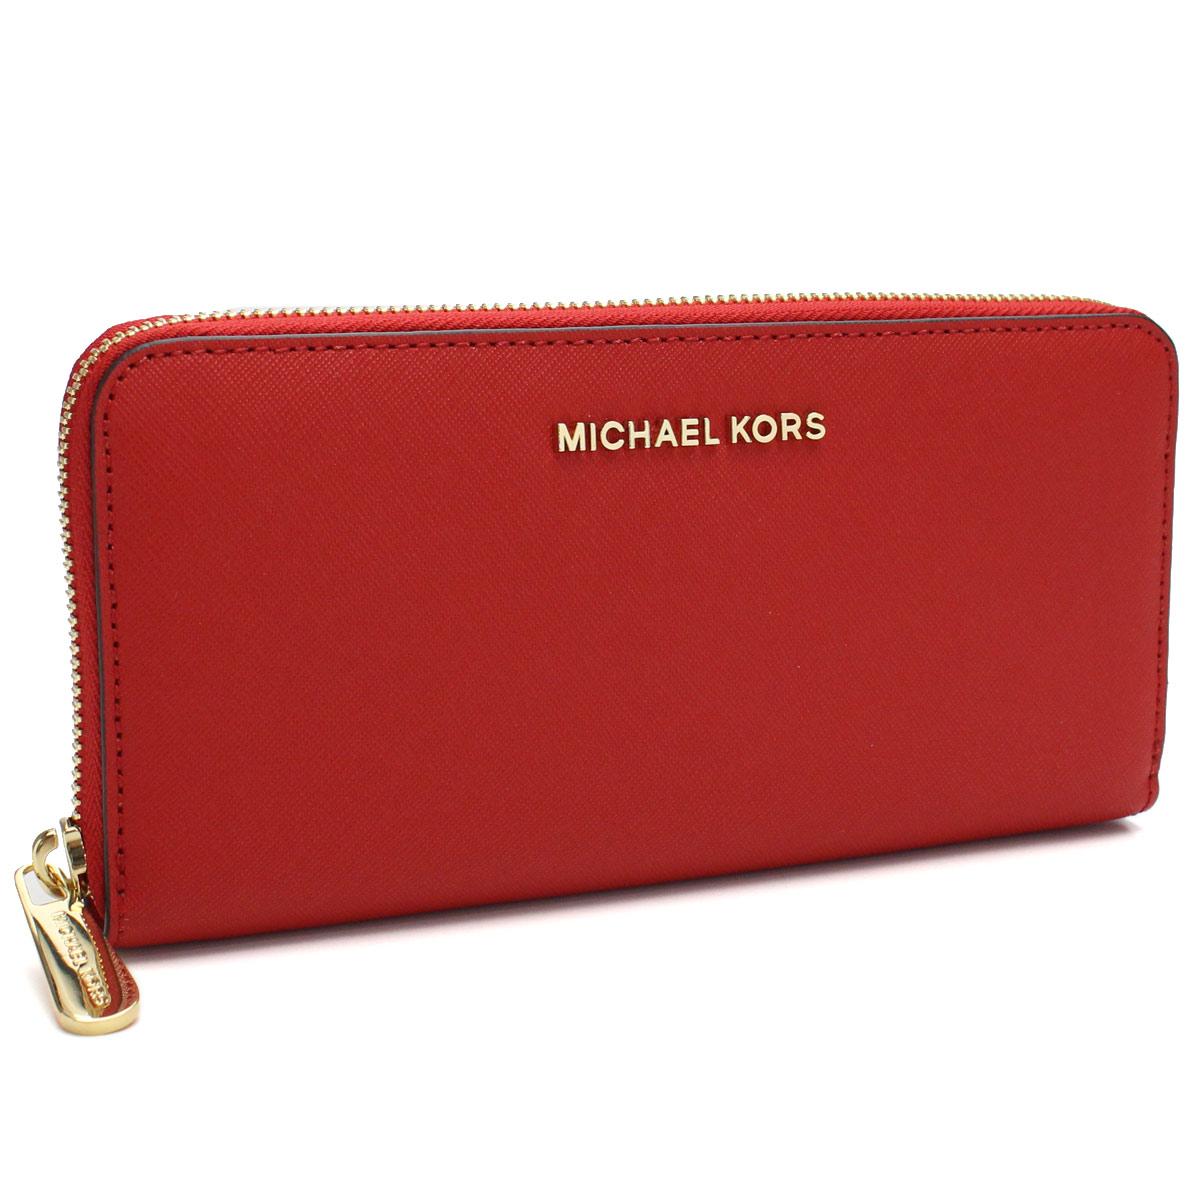 a512a5124a3a Bighit The total brand wholesale: Michael Kors MICHAEL KORS wallet ...